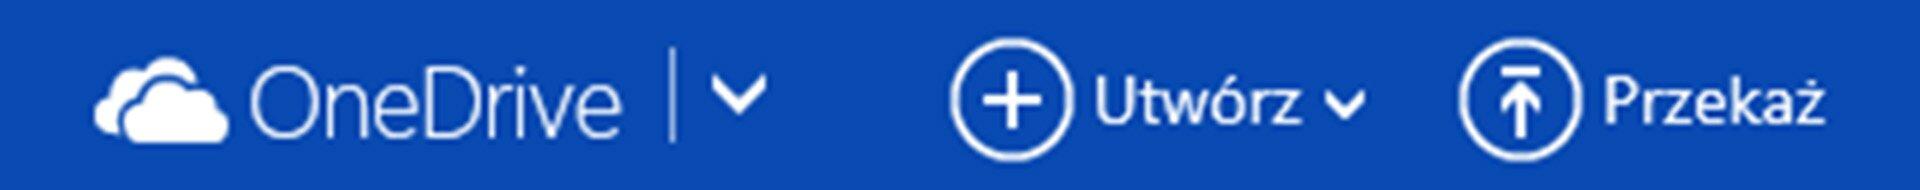 Zrzut fragmentu paska menu usługi OneDrive